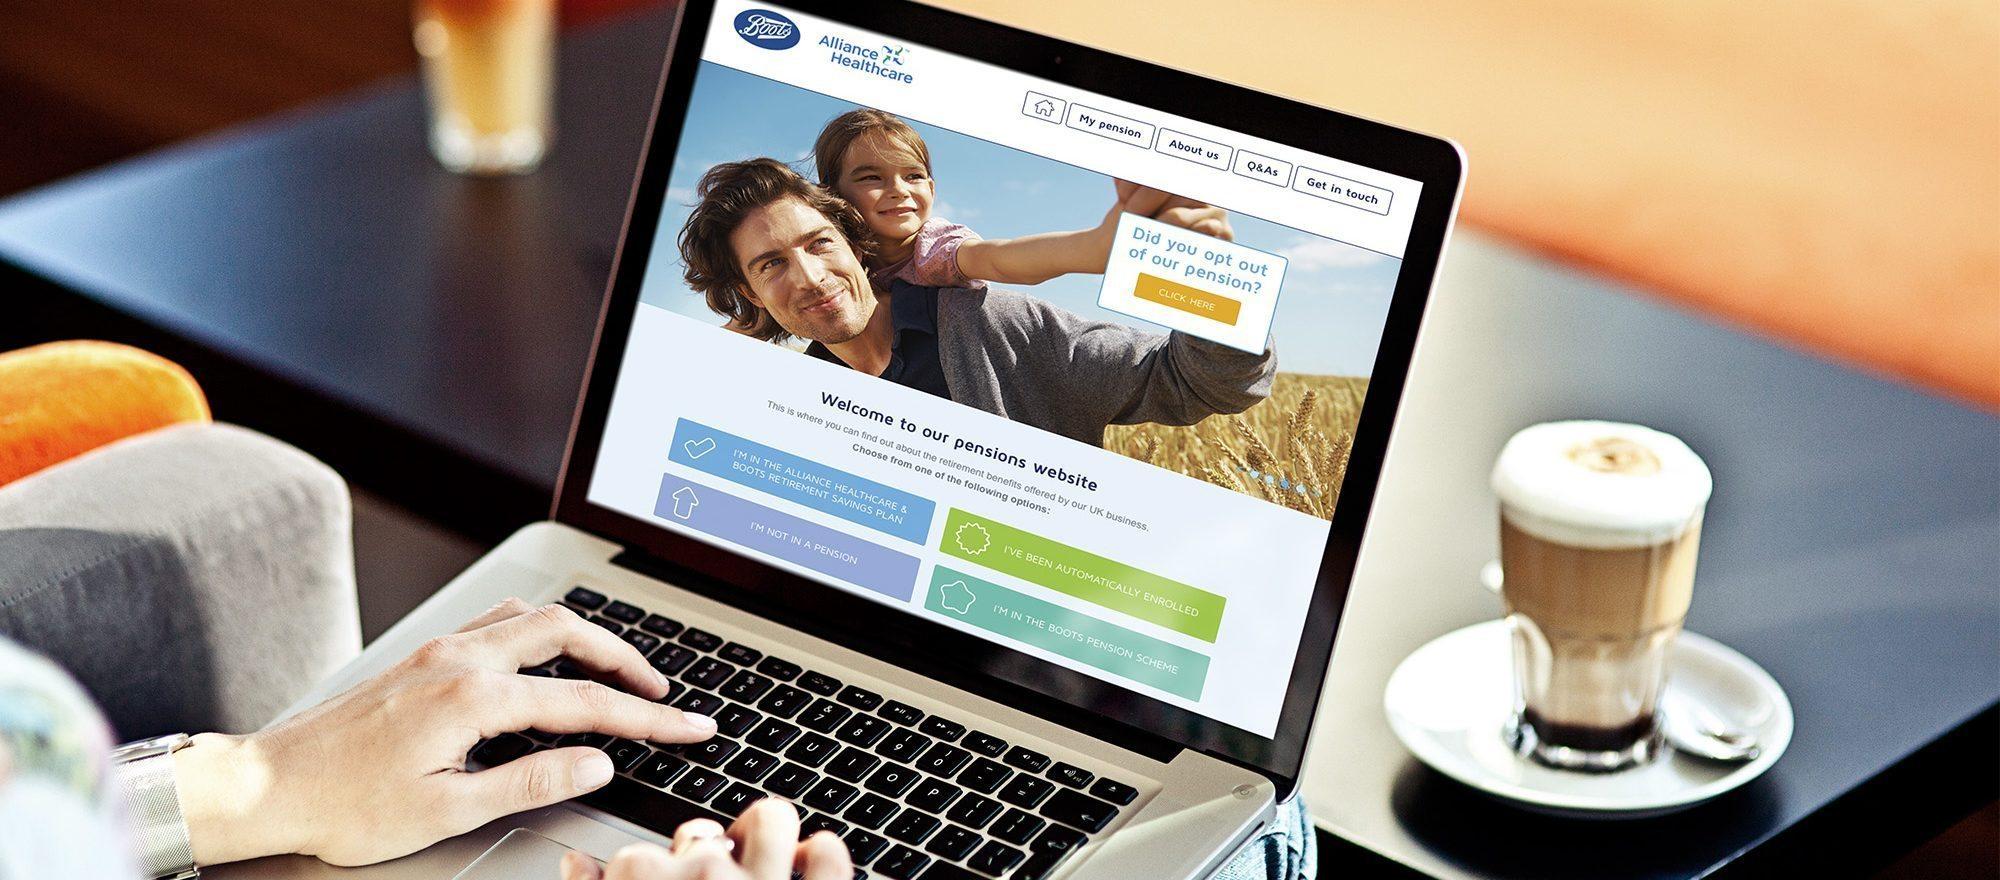 Alliance Healthcare - Customer Case Study | KeyedIn Projects